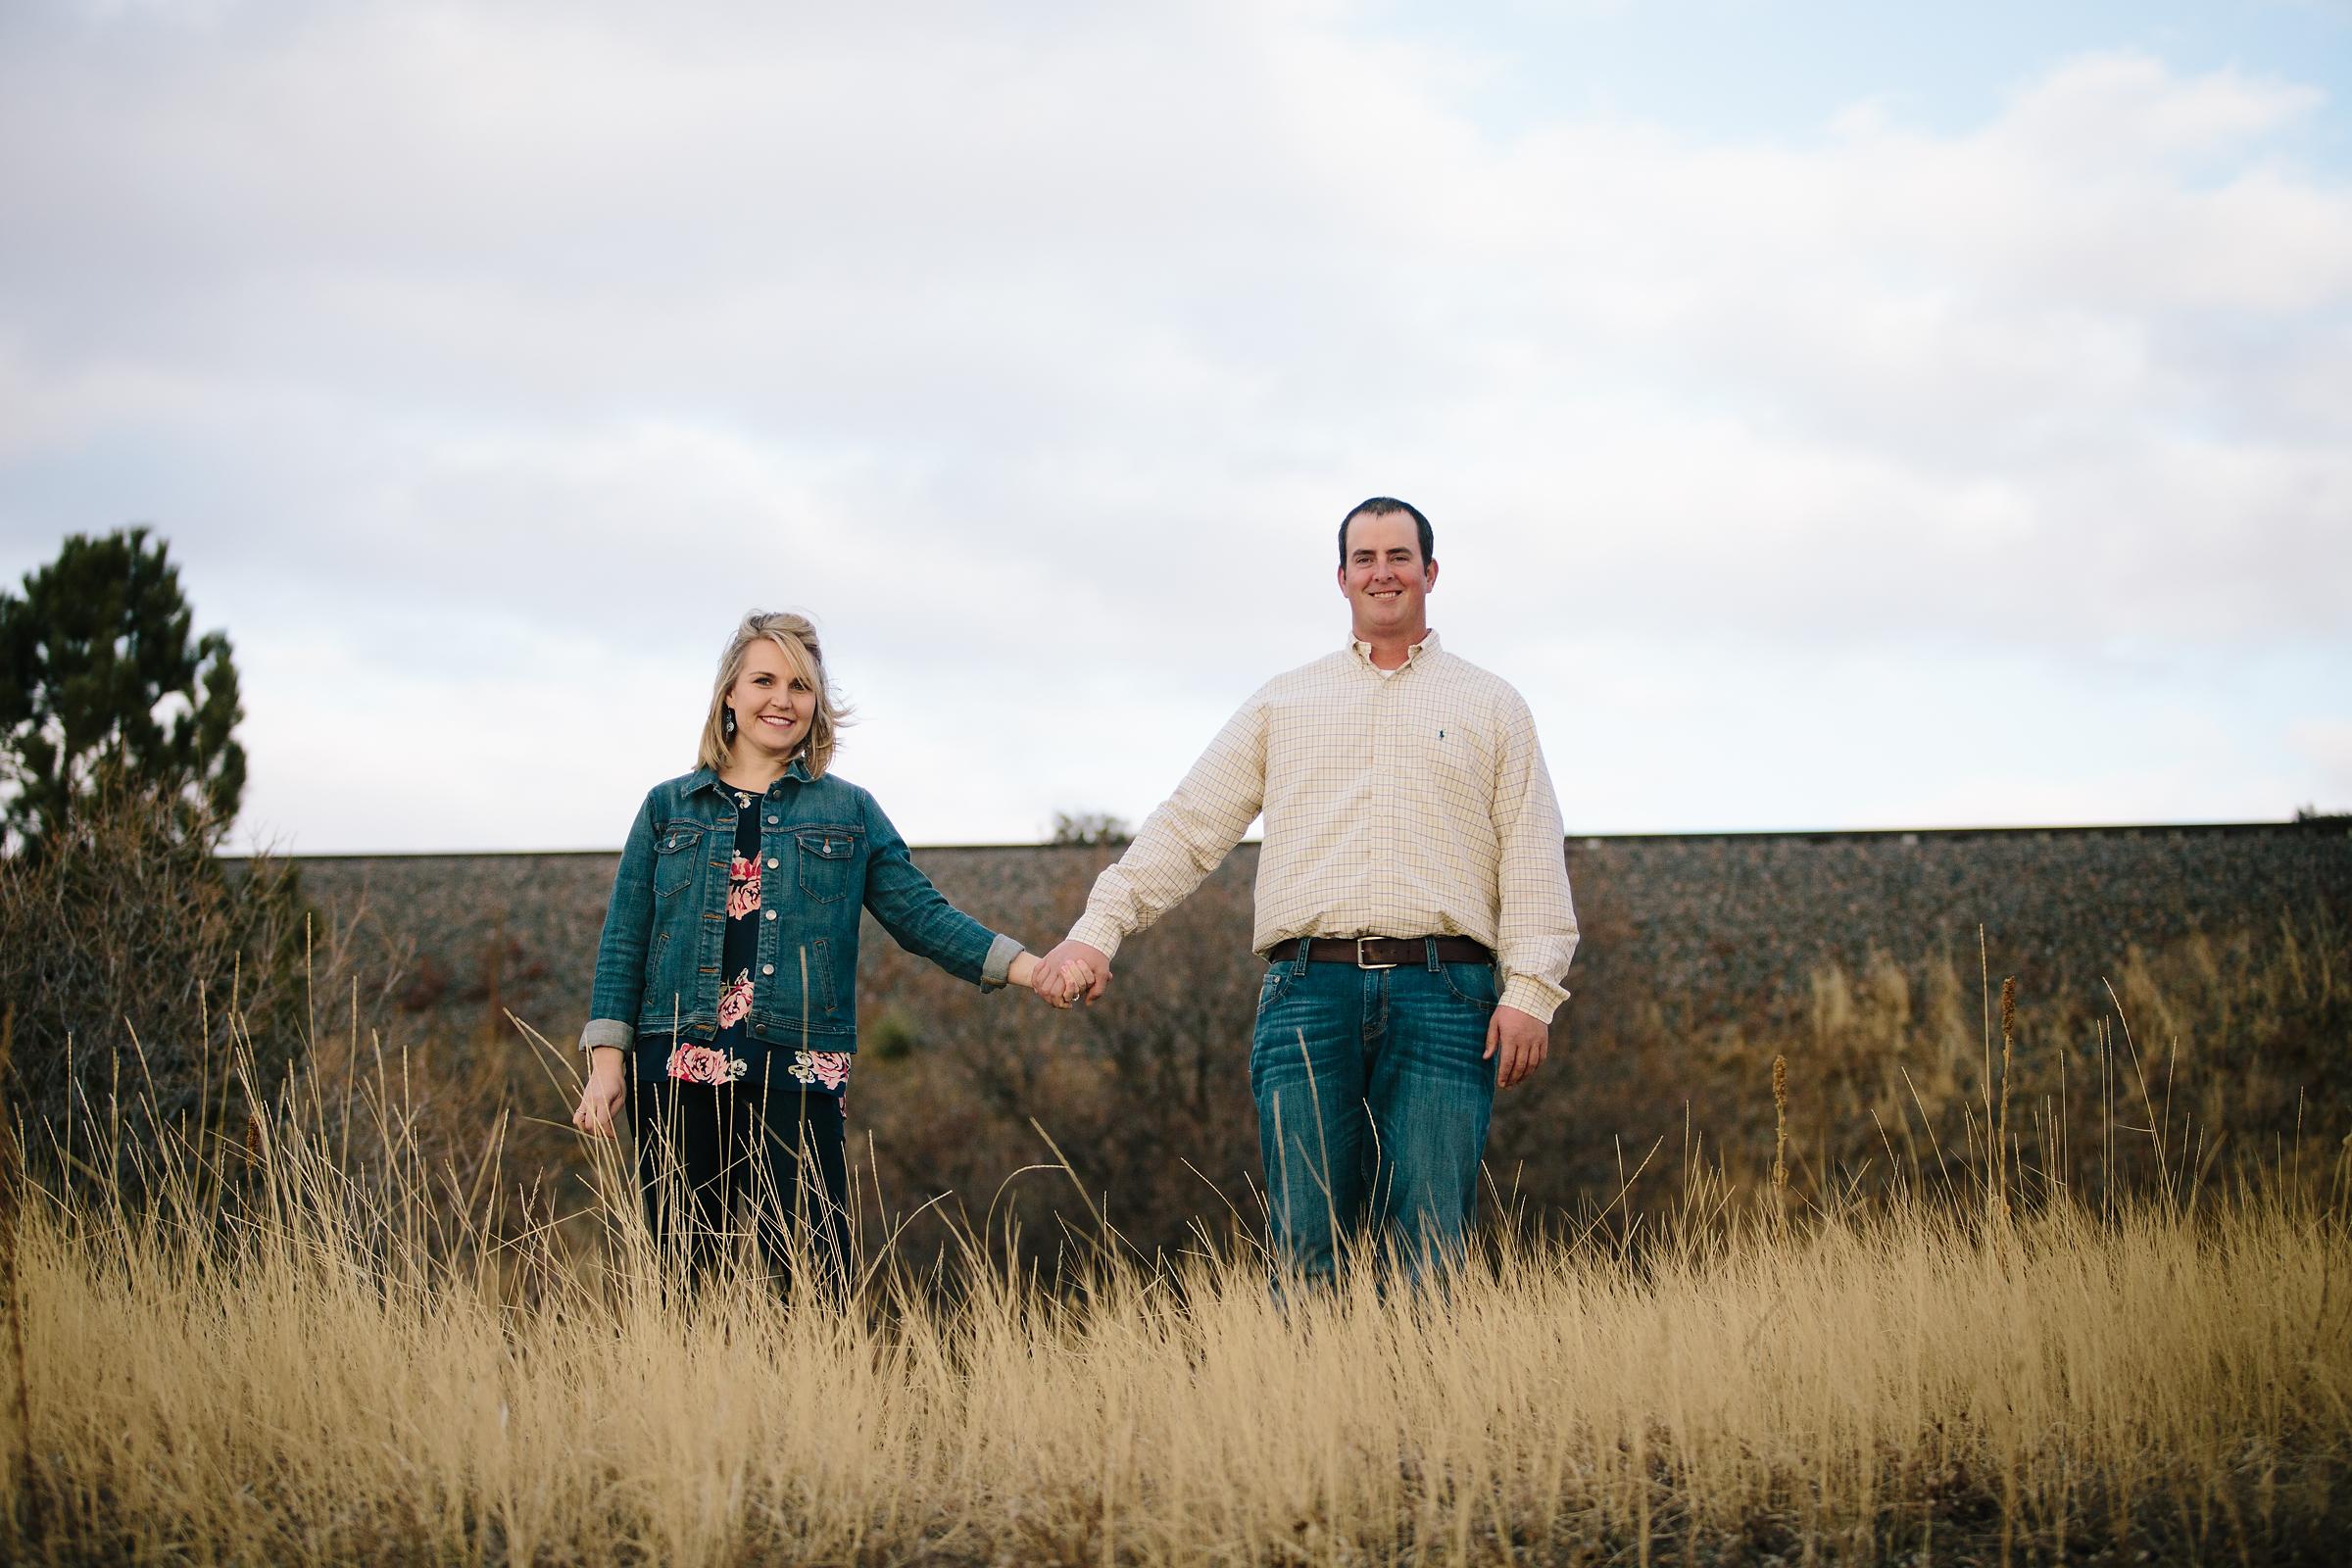 Colorado Engagement, Castle Rock, Photography, Adam Pacheco Photography105.JPG